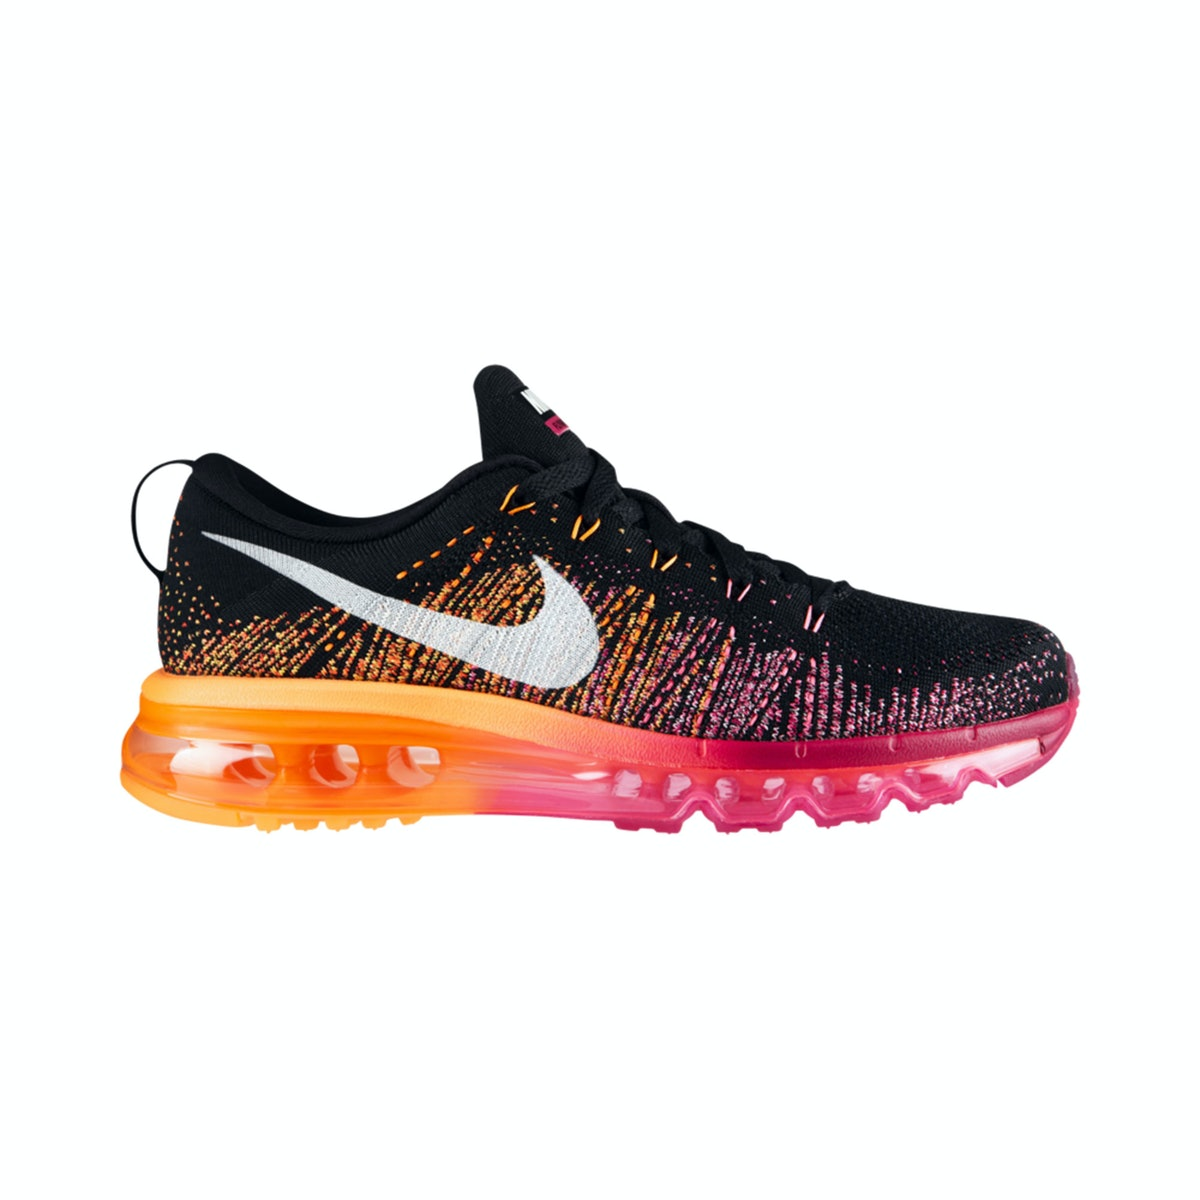 Nike flyknit air max running shoe, $225, [nike.com](http://store.nike.com/us/en_us/pd/flyknit-air-ma...